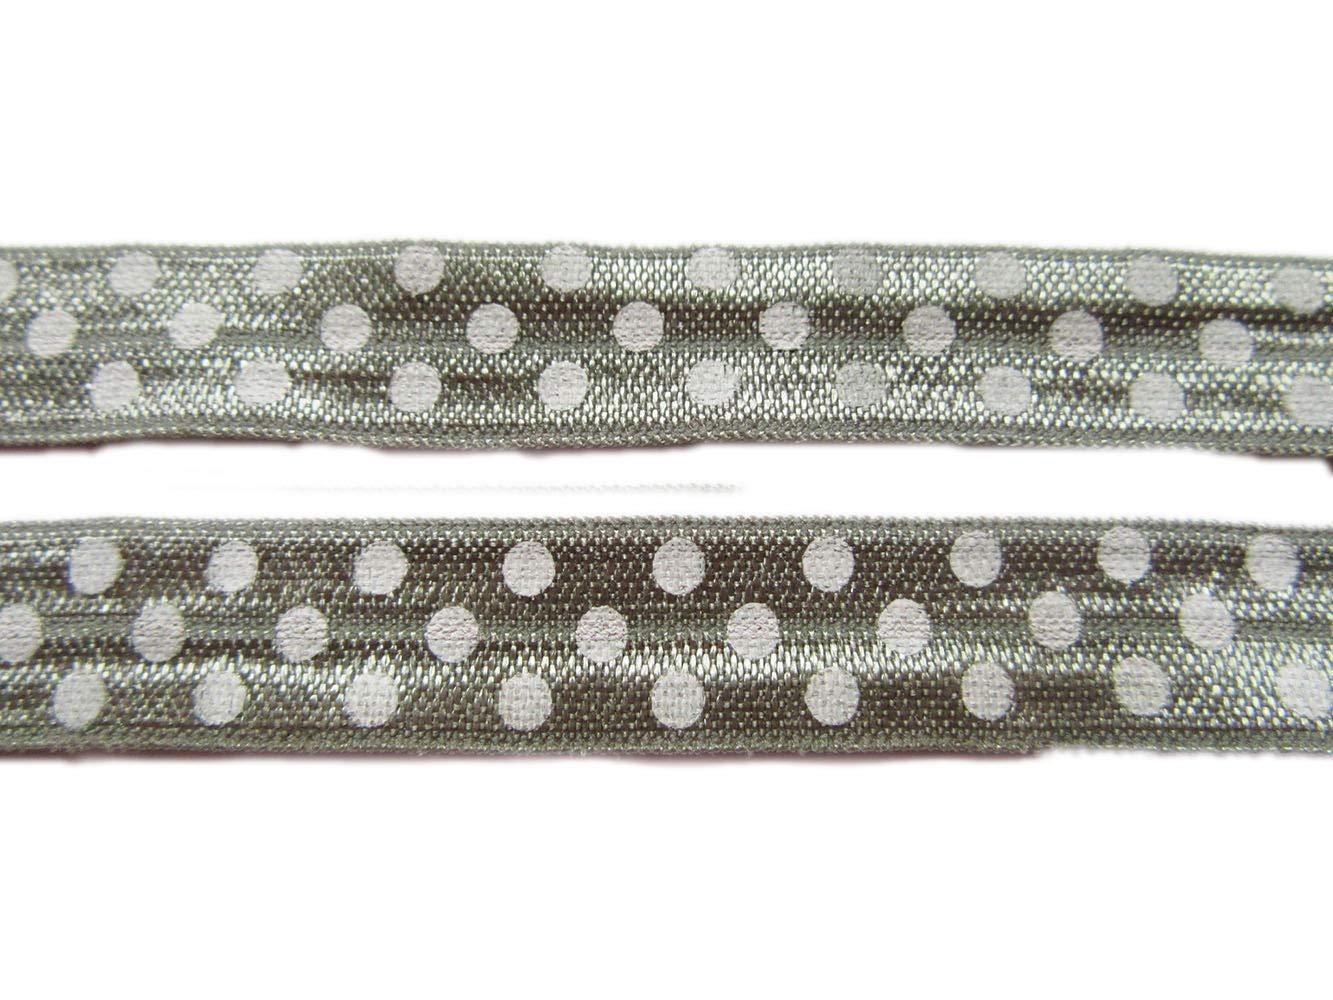 YYCRAFT Pack 10 Yards Gold Arrow Fold Over Elastic Stretch Foldover FOE Elastics for Hair Ties Headbands-Black